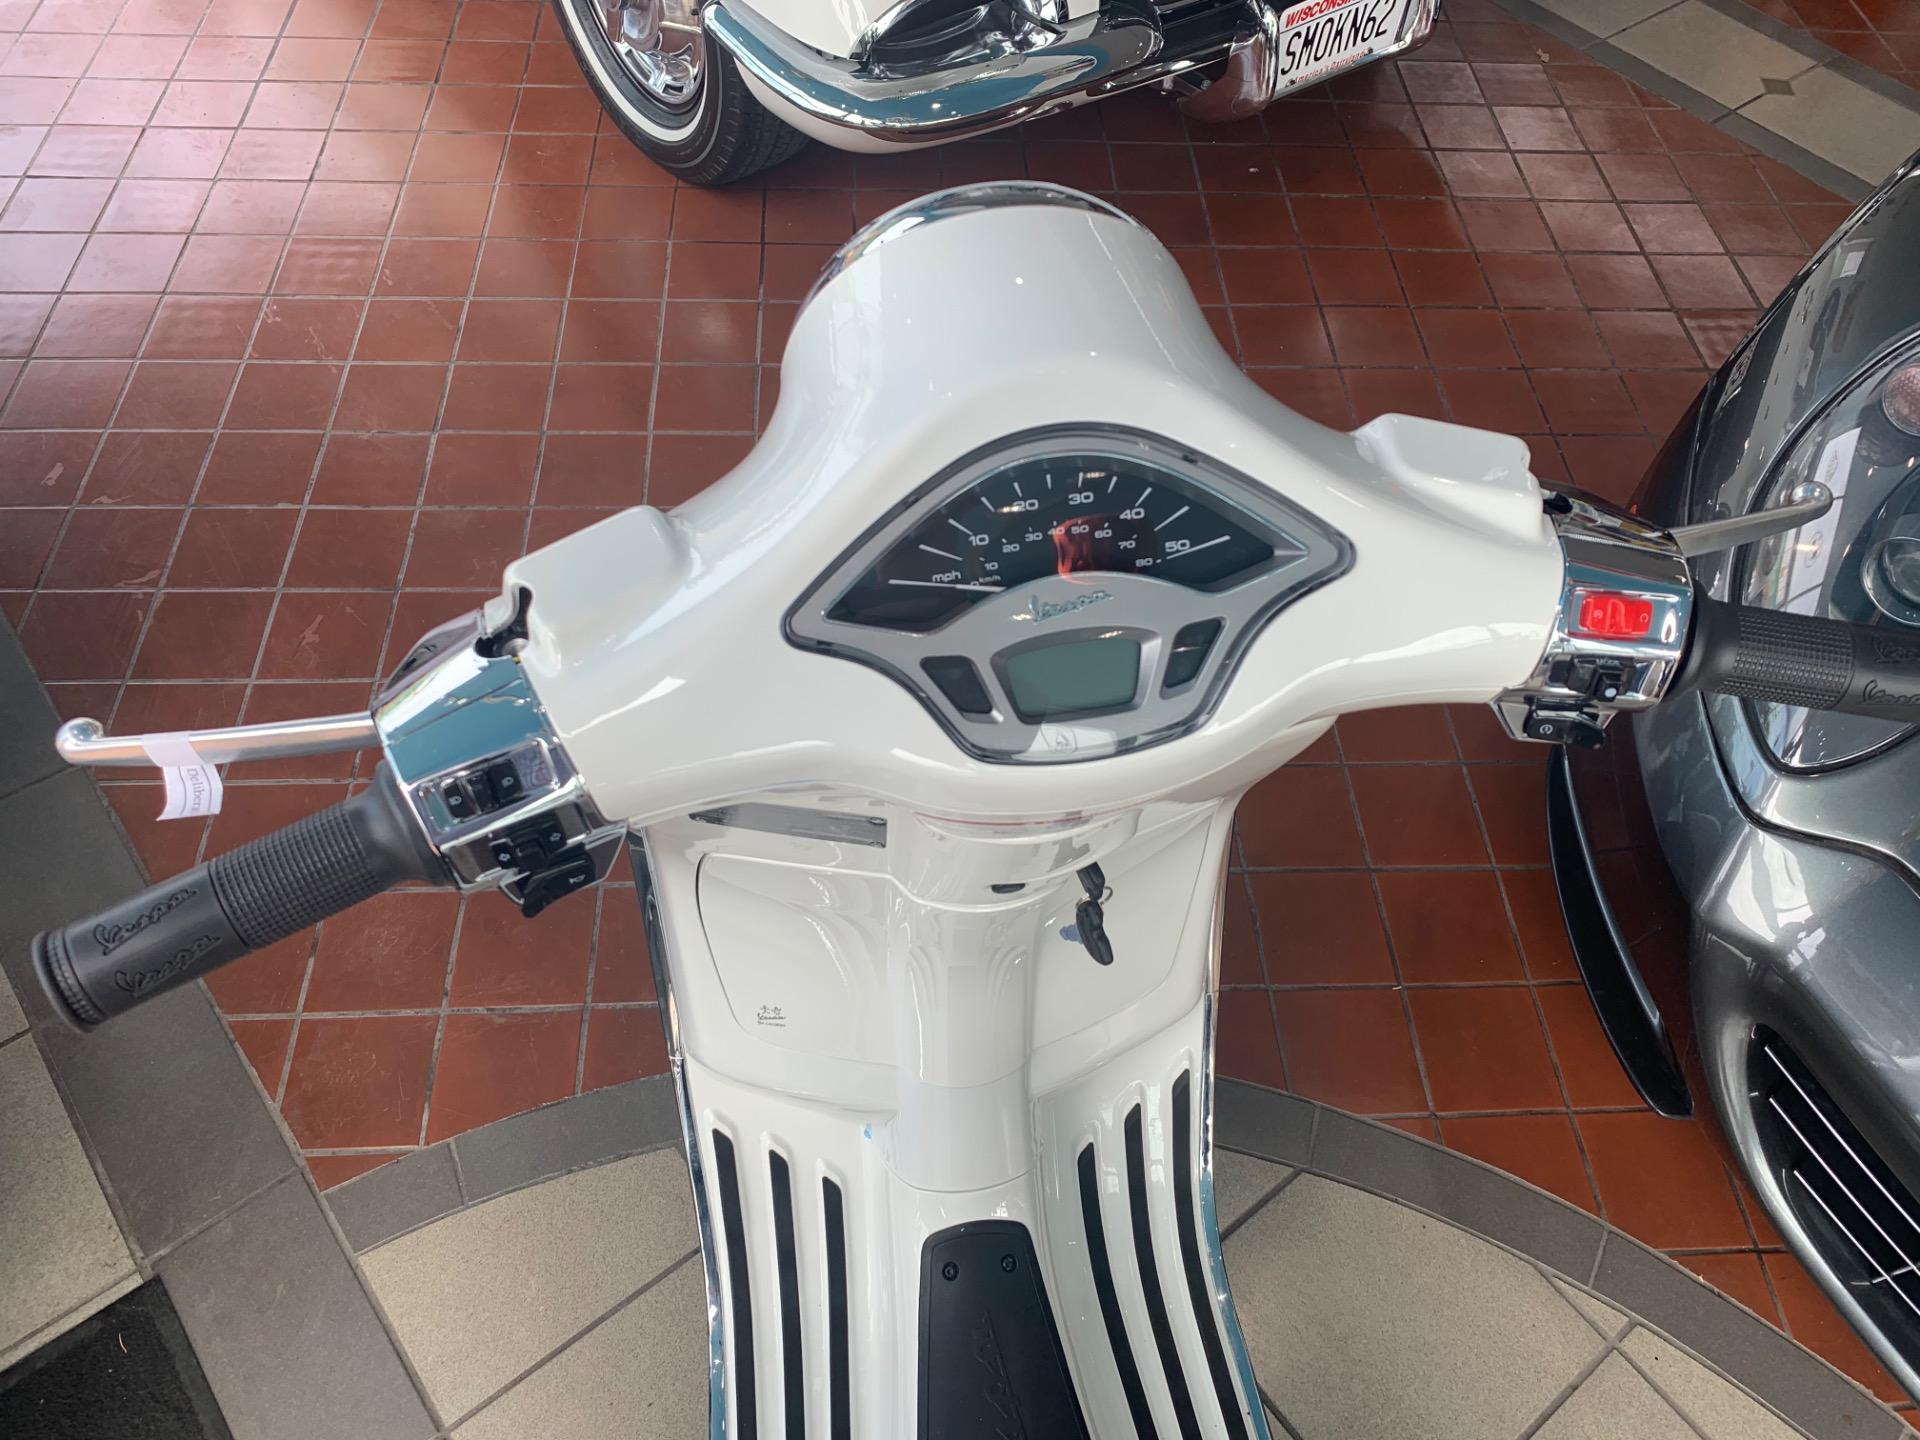 New-2020-VESPA-PRIMAVERA-50